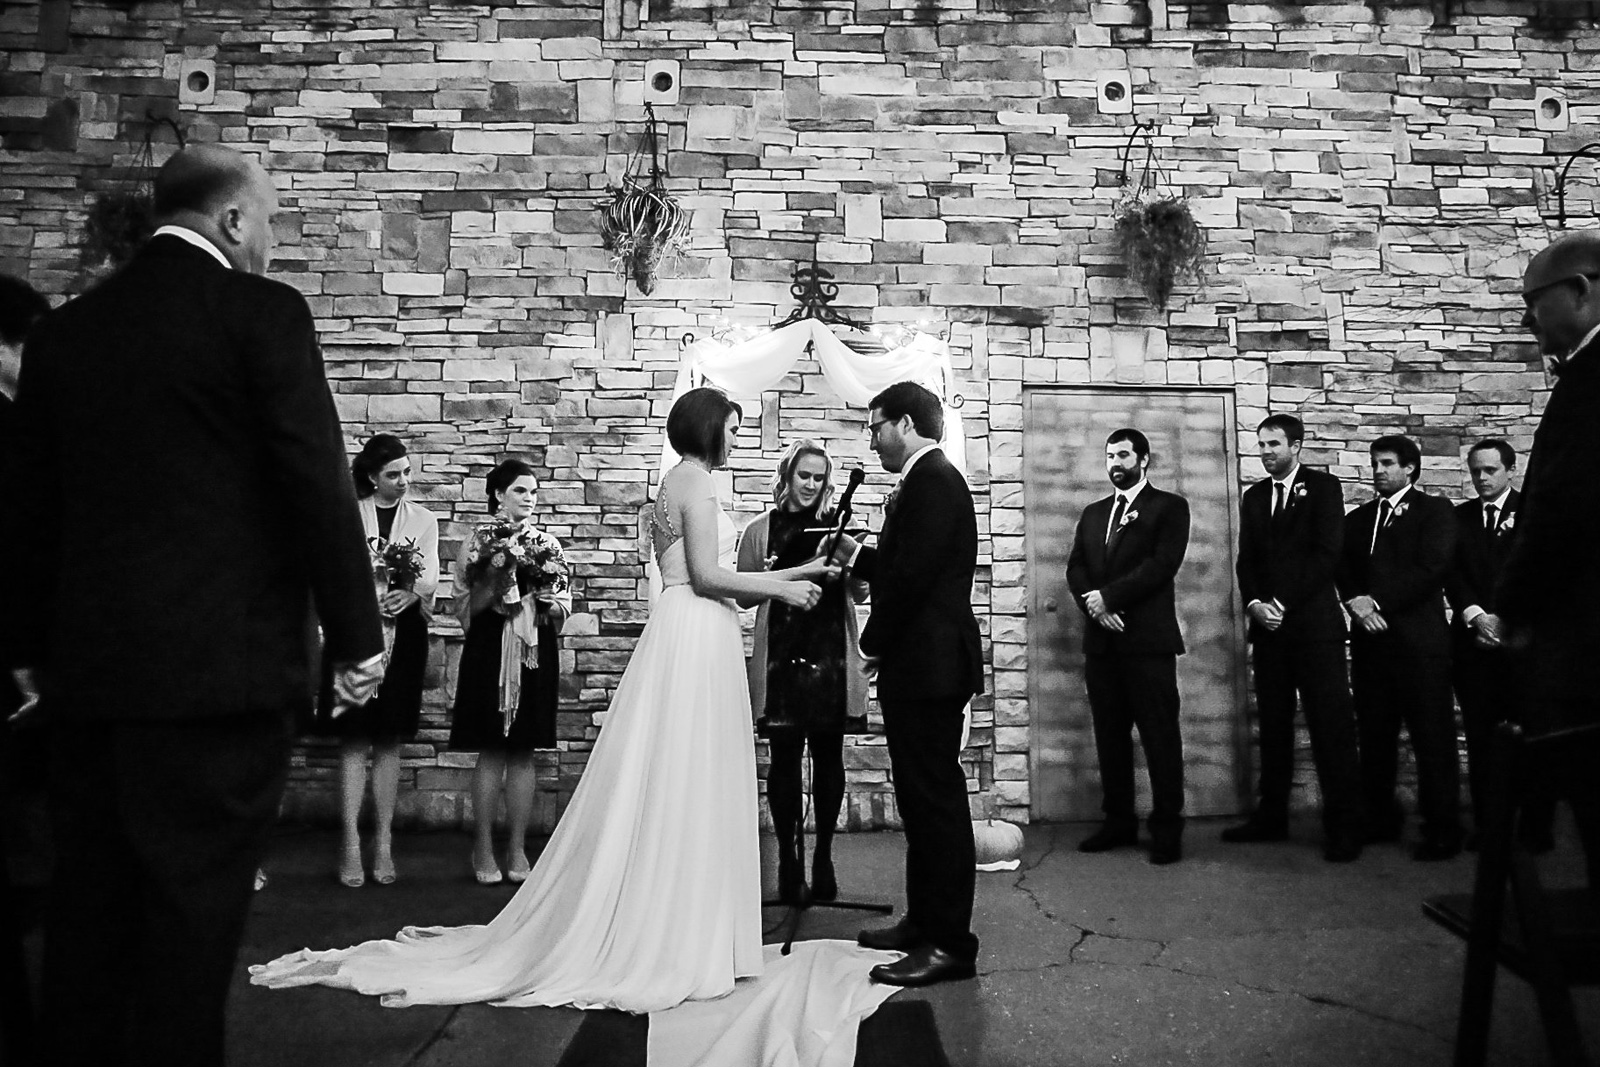 Oldani Photography-St Louis-Wedding Photos-wedding photographer-wedding party-outdoor wedding-Mad Art Gallery-reception-rain_20141122_18401112.jpg